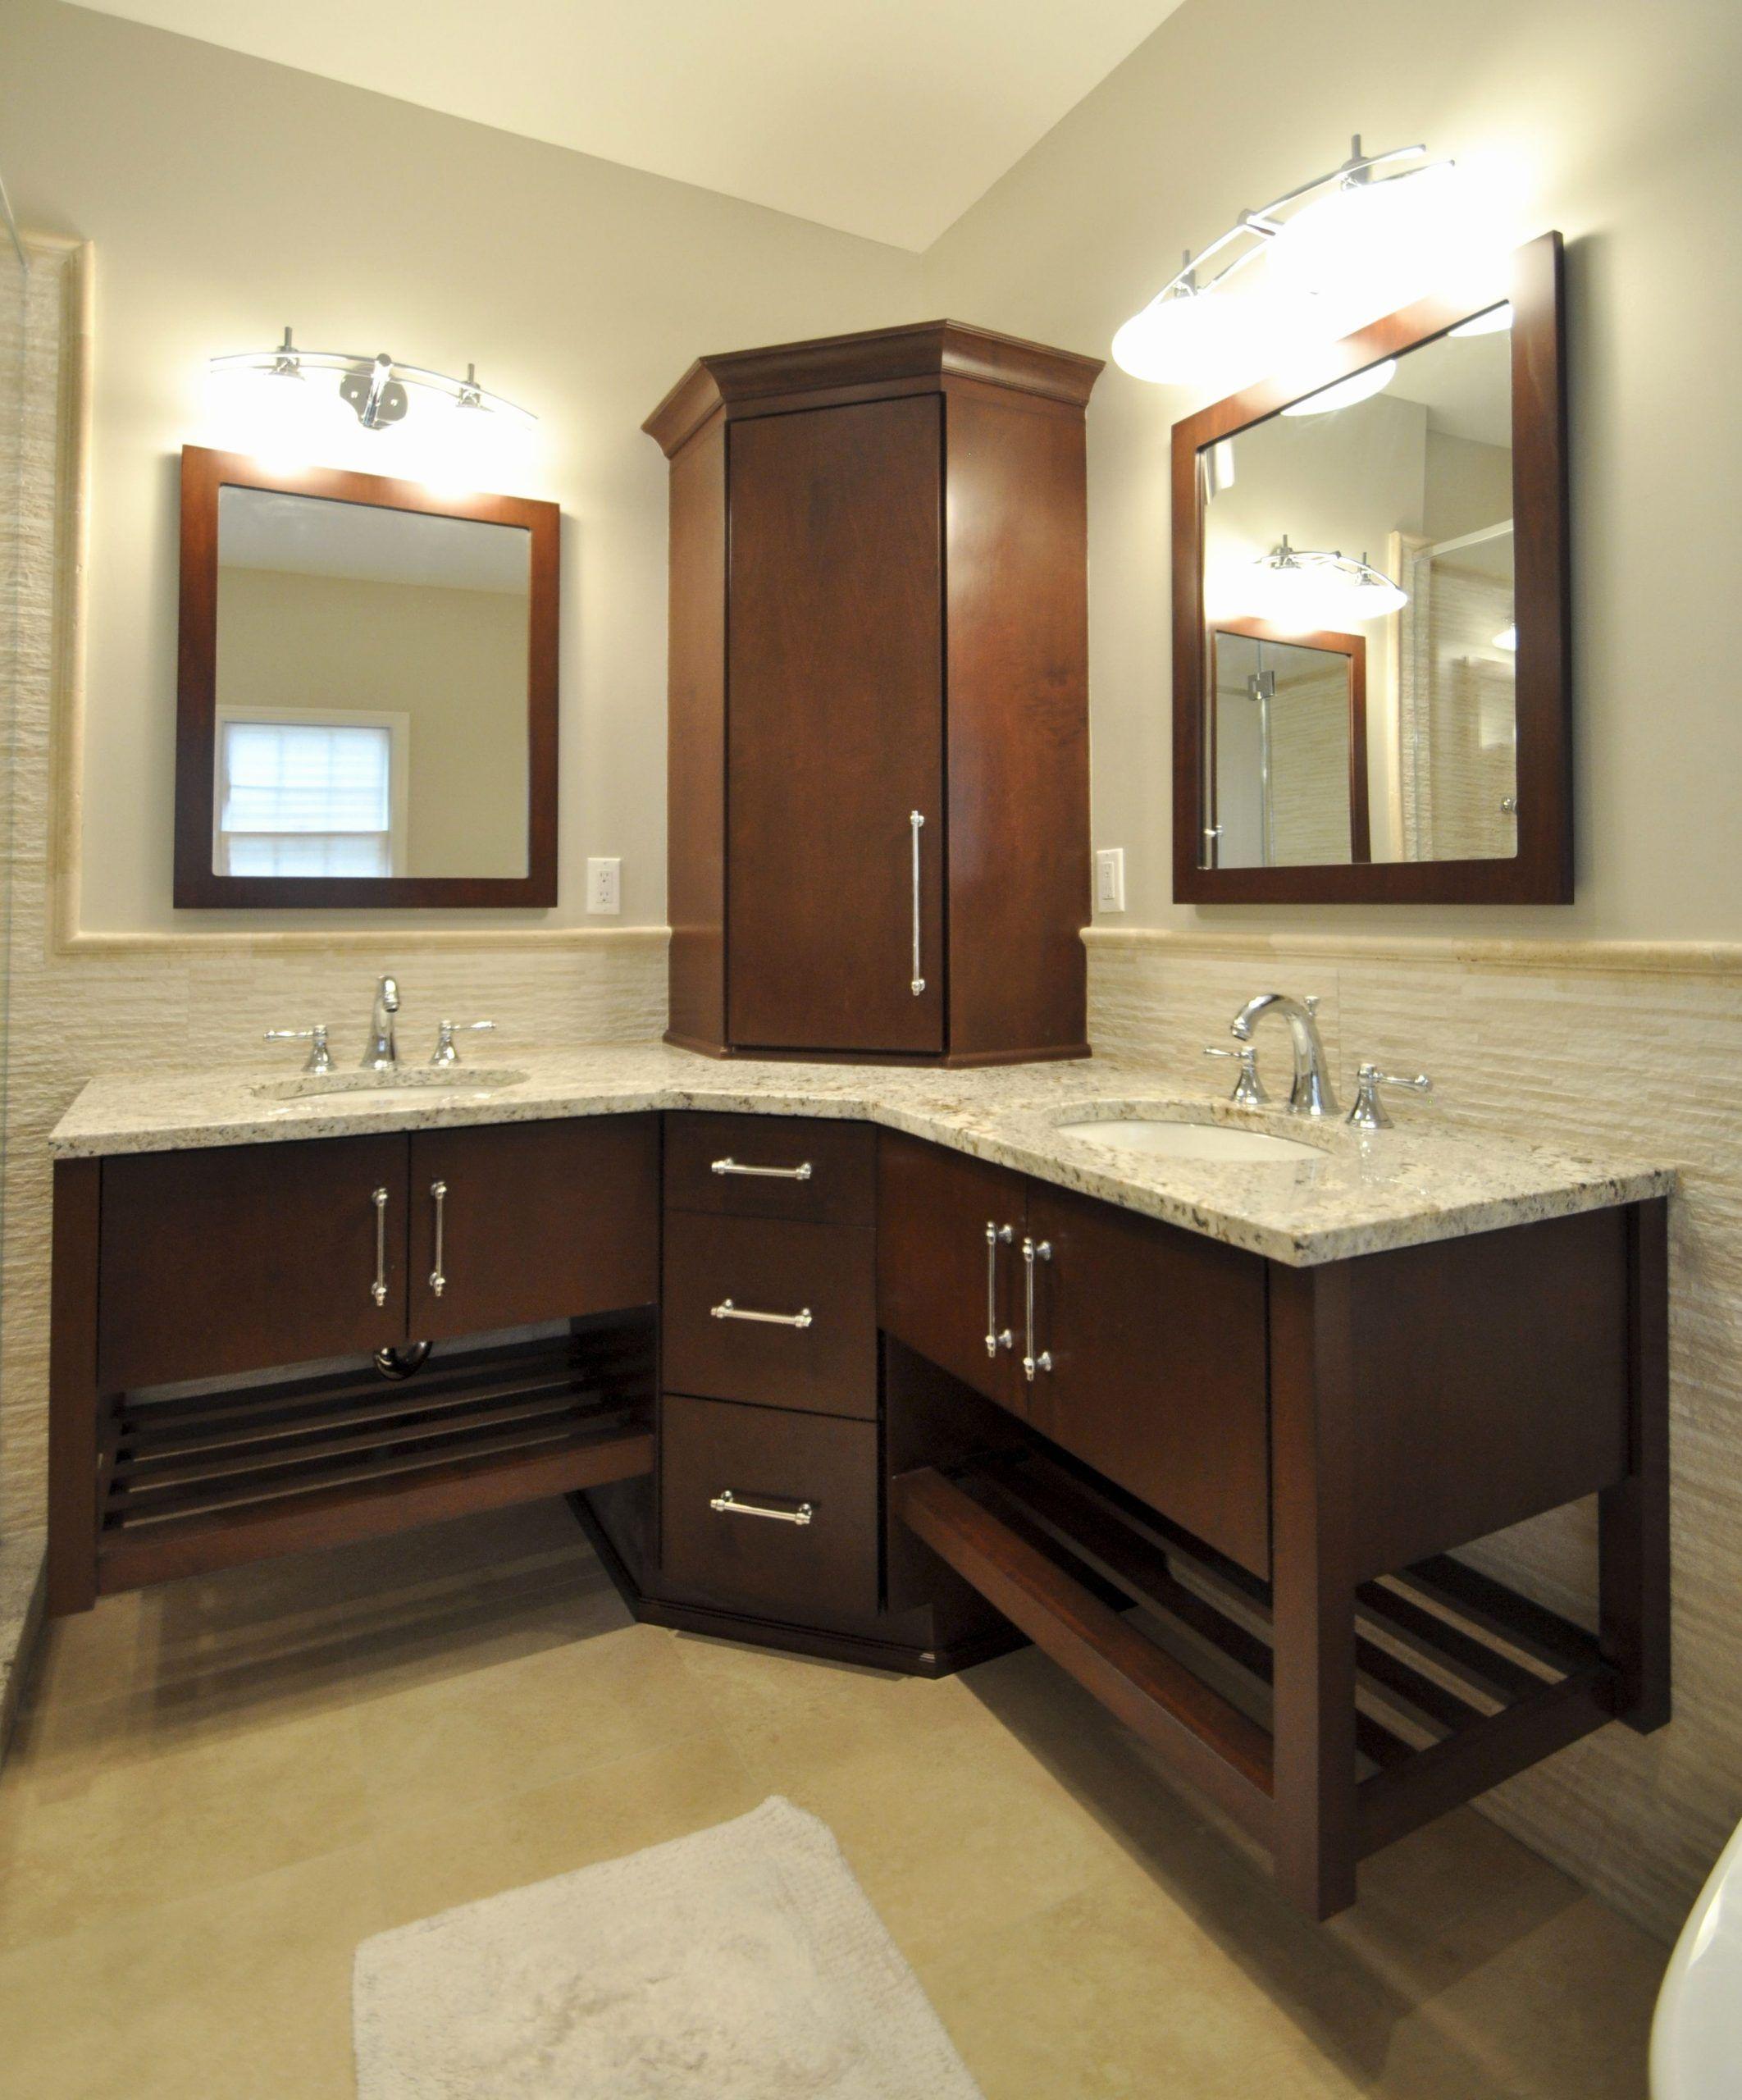 Bathroom Corner Cabinet Ideas Inspirational Bathrooms Small Bathroom Vanities Bathroom Remodel Master Bathroom Corner Cabinet